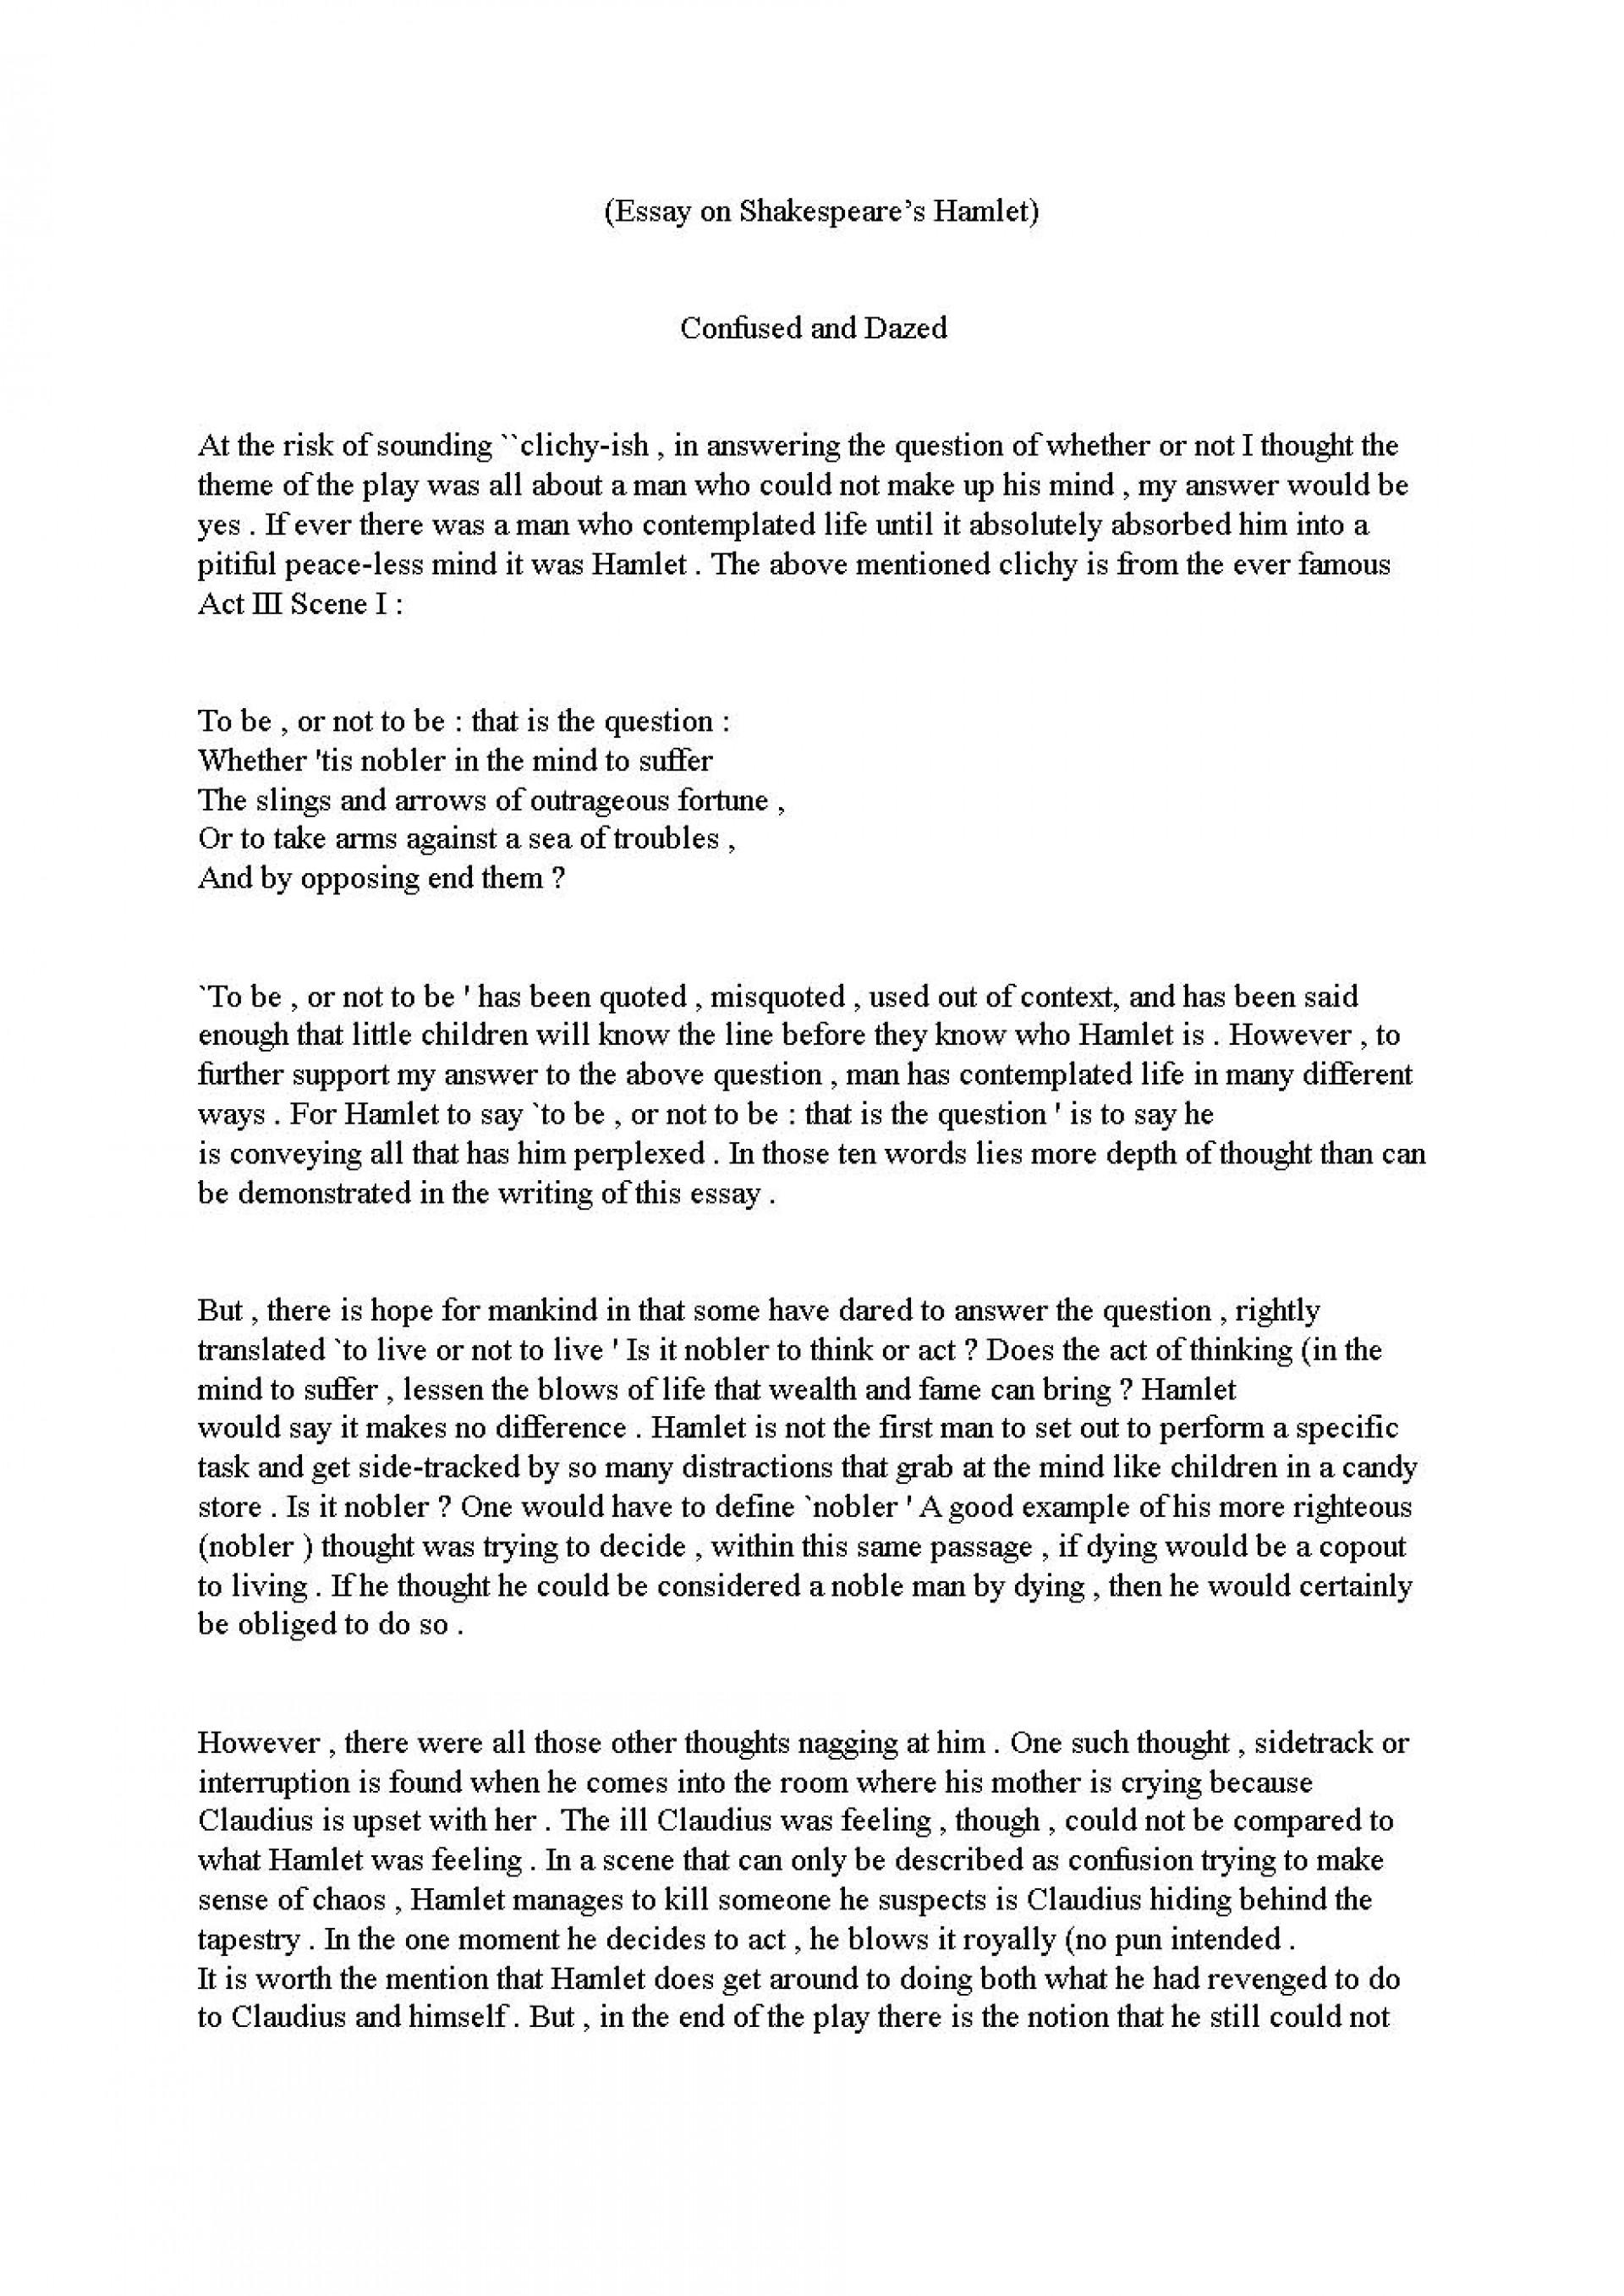 005 Public Speaking Essay Stunning Topics Example Introduction 1920